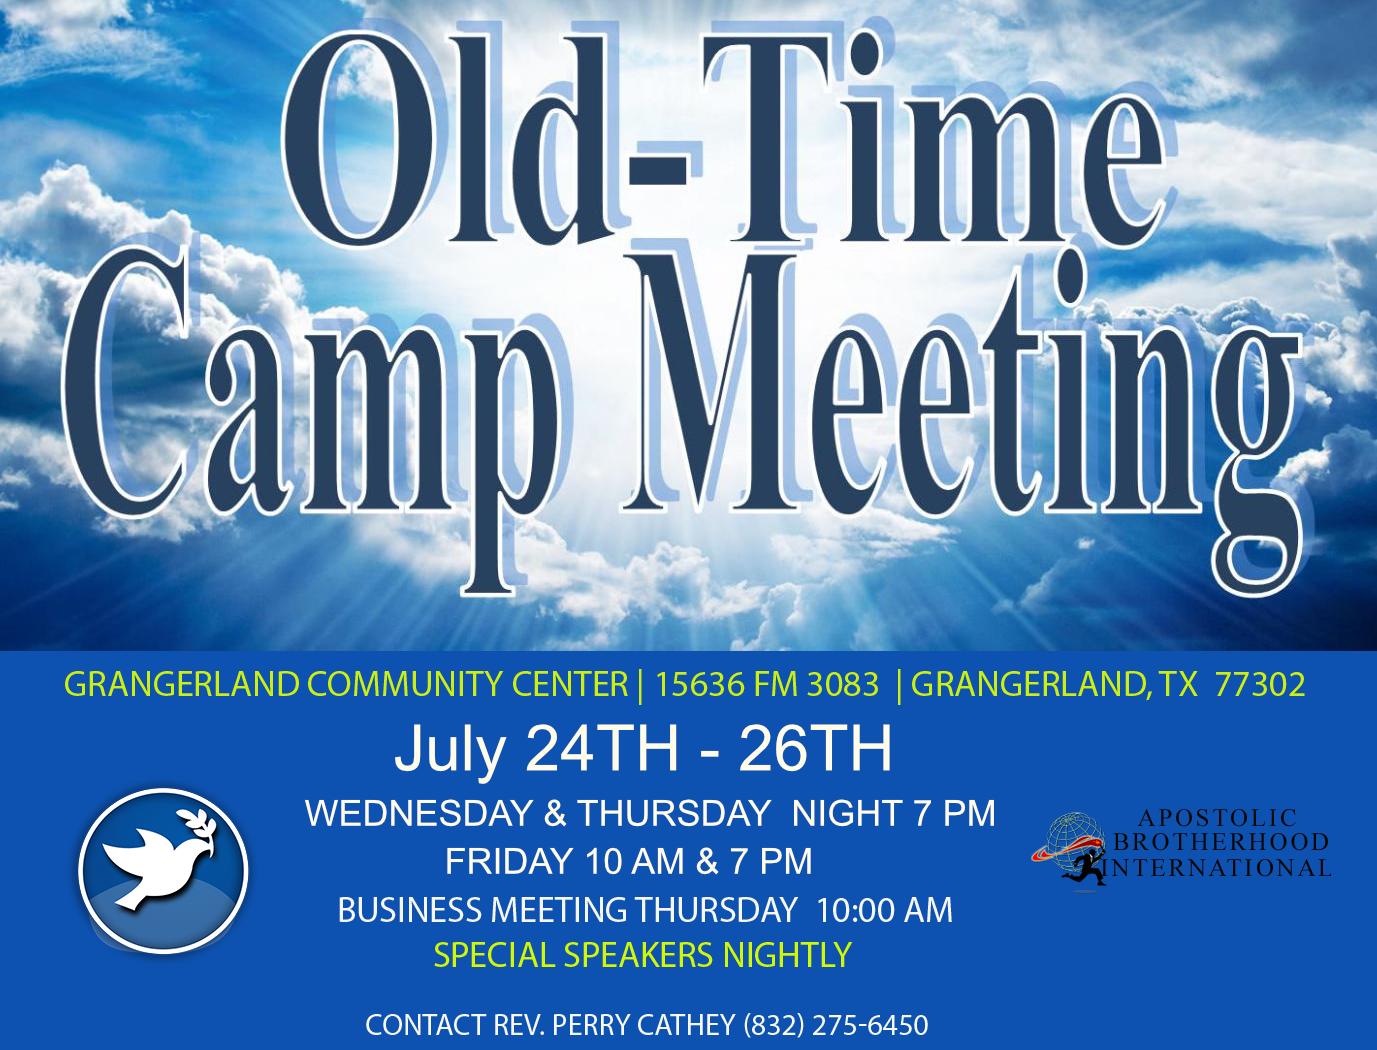 2019 Camp Meeting